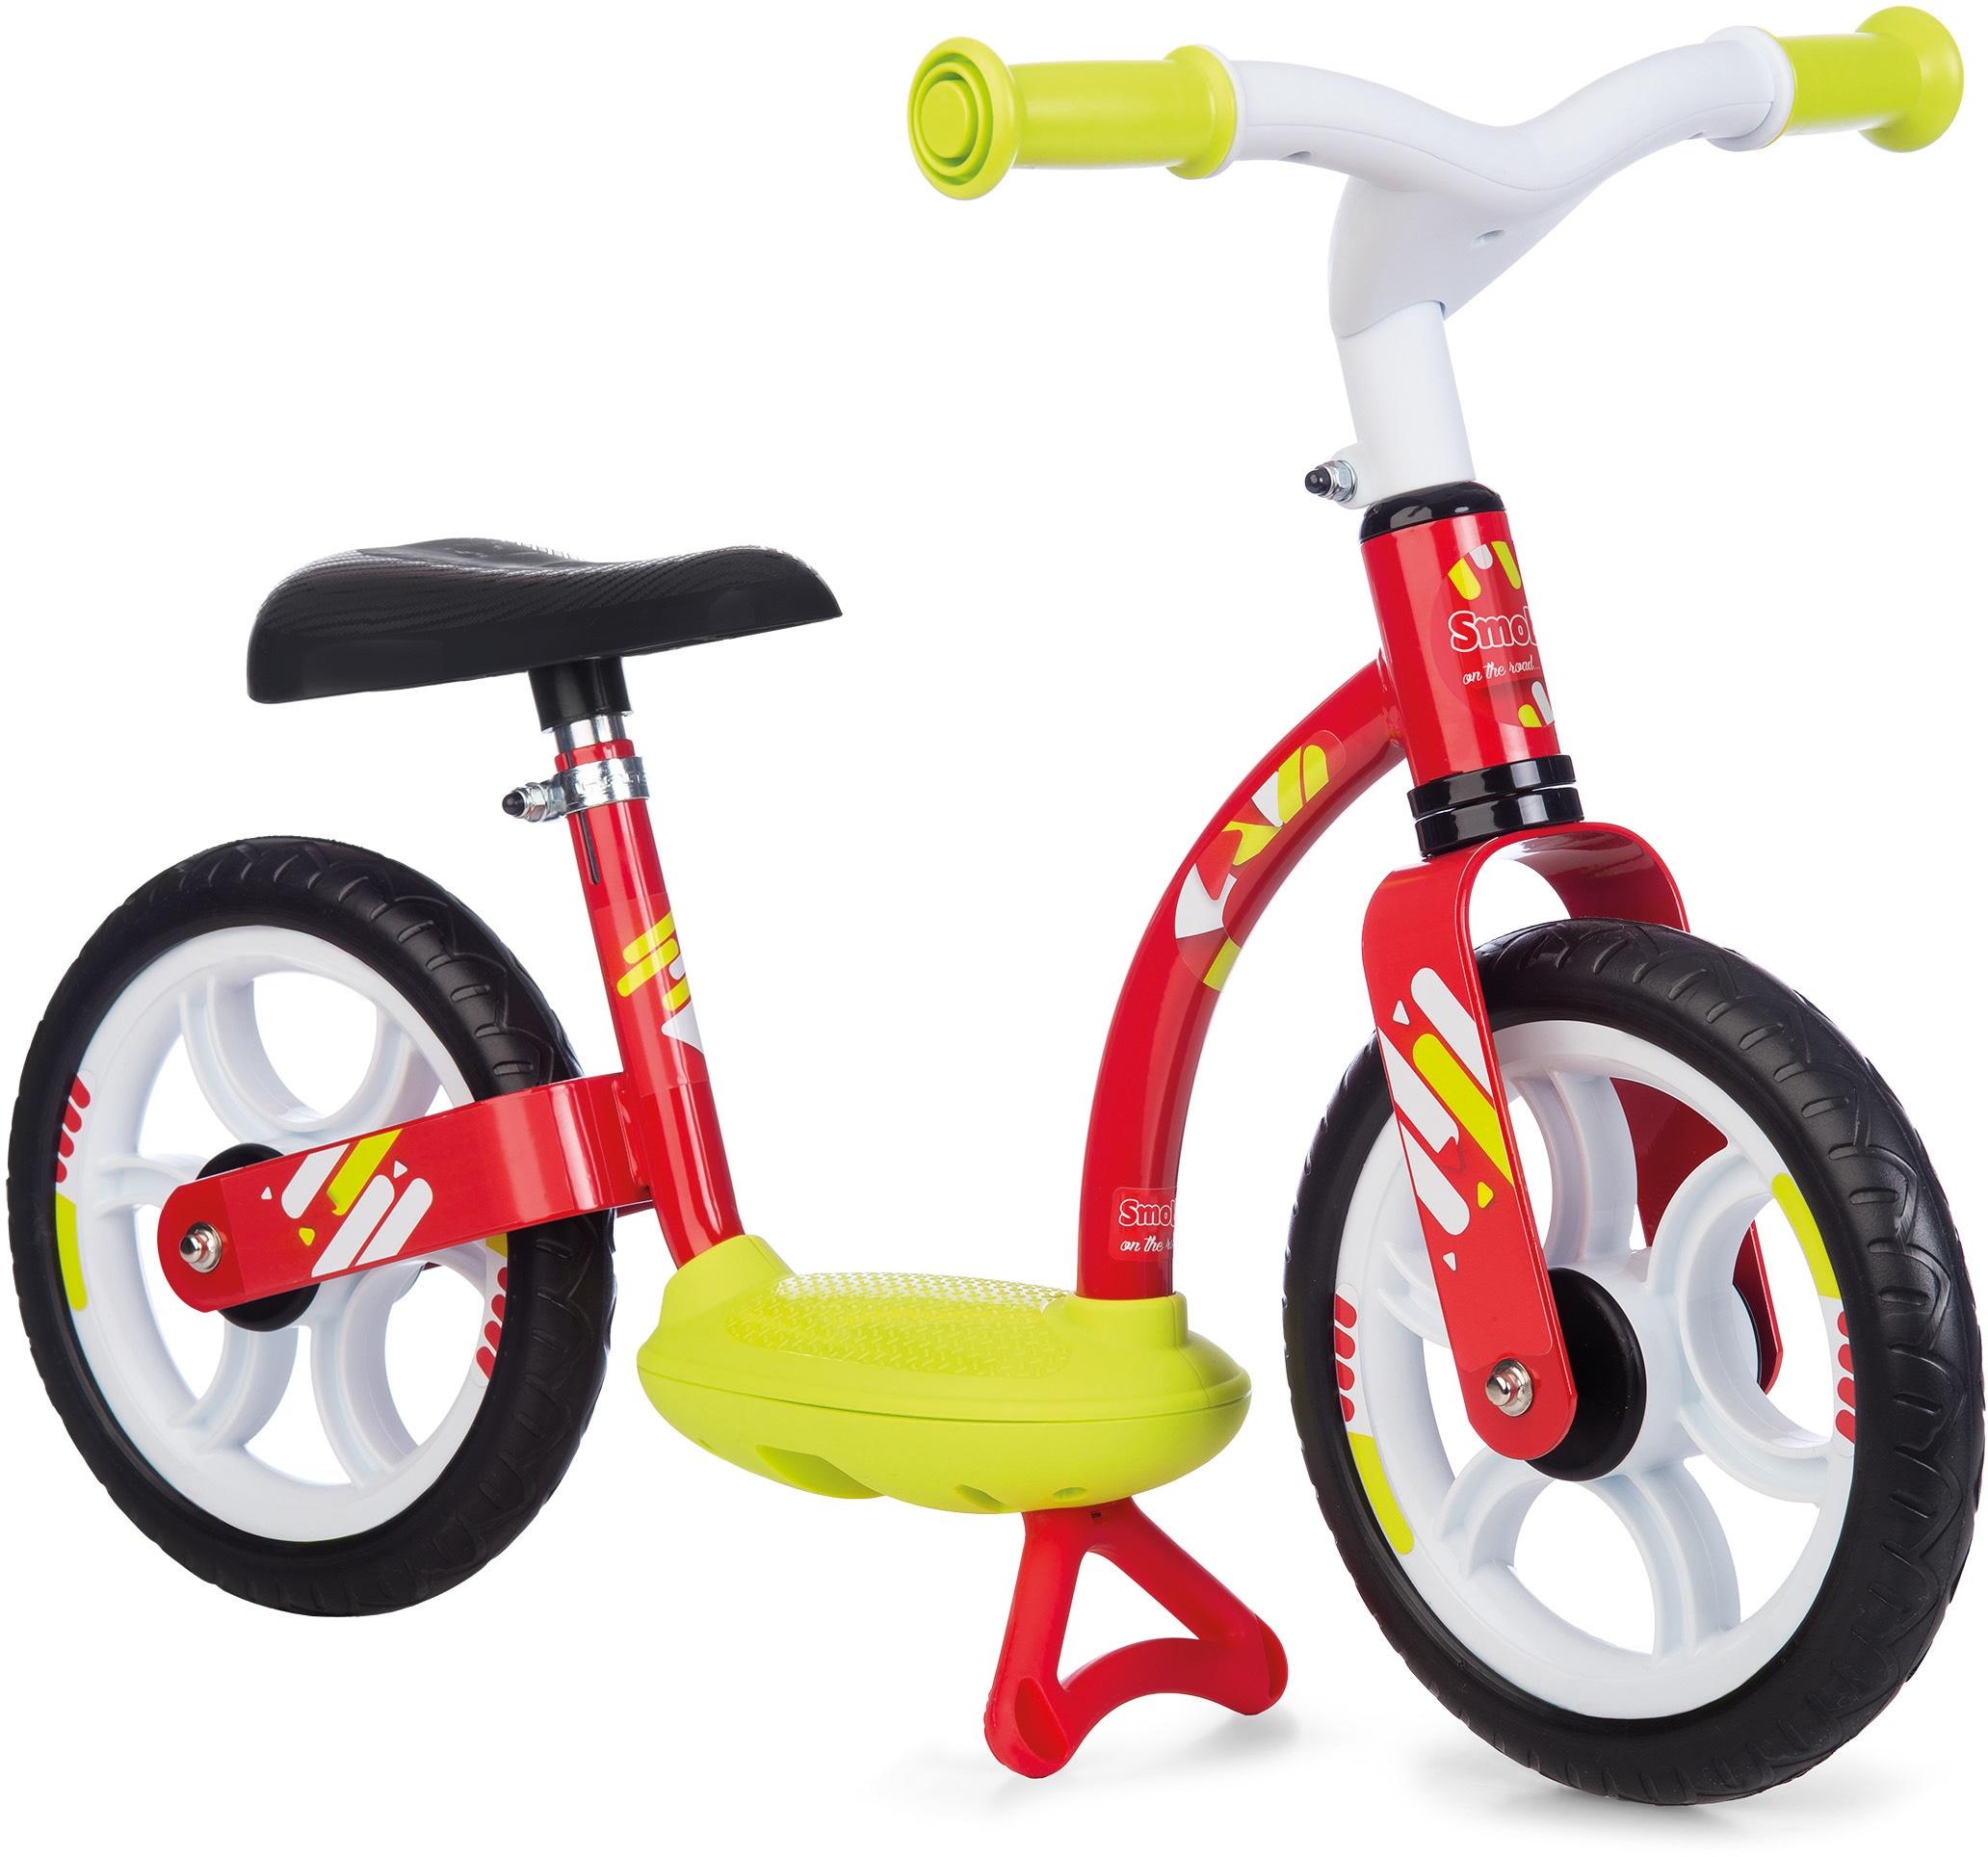 Smoby Laufrad Laufrad, rot, Made in Europe rot Kinder Laufräder Fahrräder Zubehör